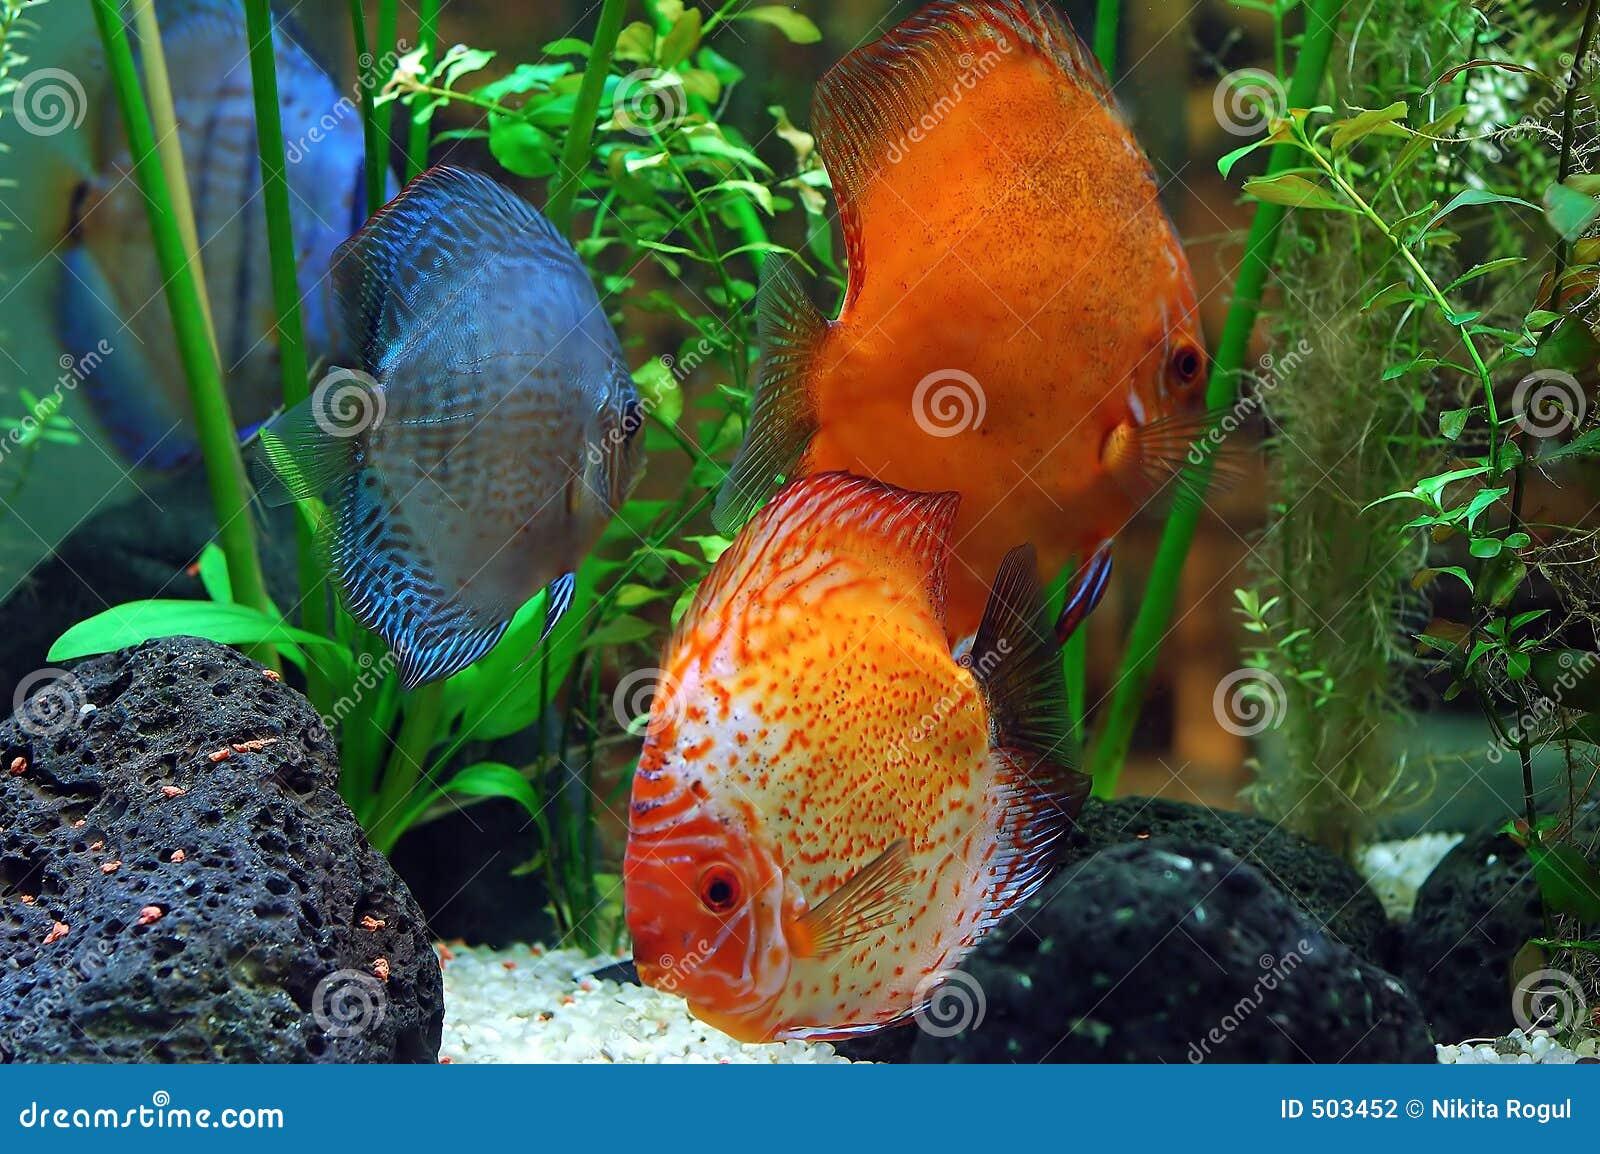 Diskus fish stock photography image 503452 for Diskus aquarium